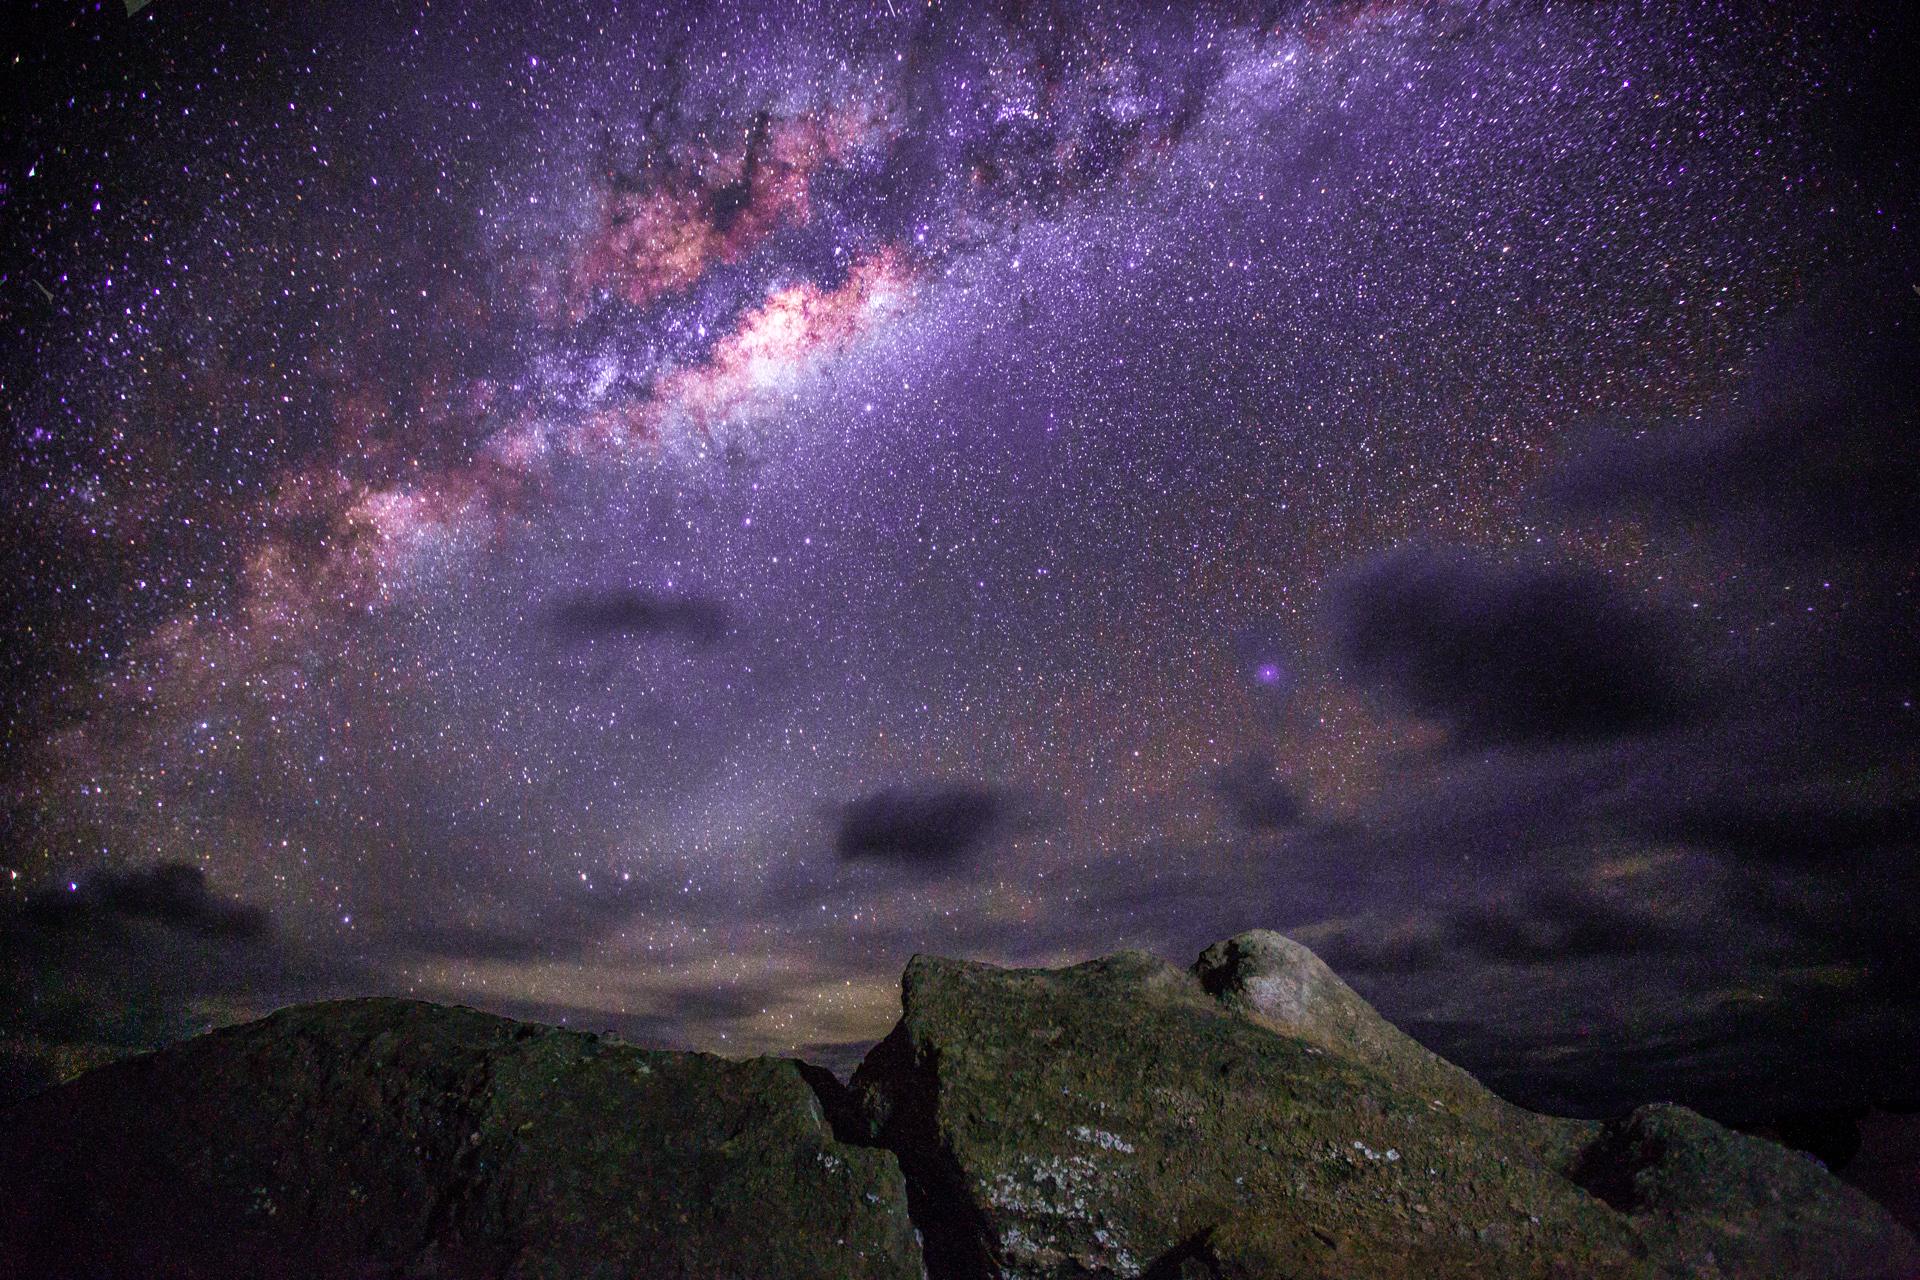 Ahu Tongariki, Easter Island (by Anne Dirkse)